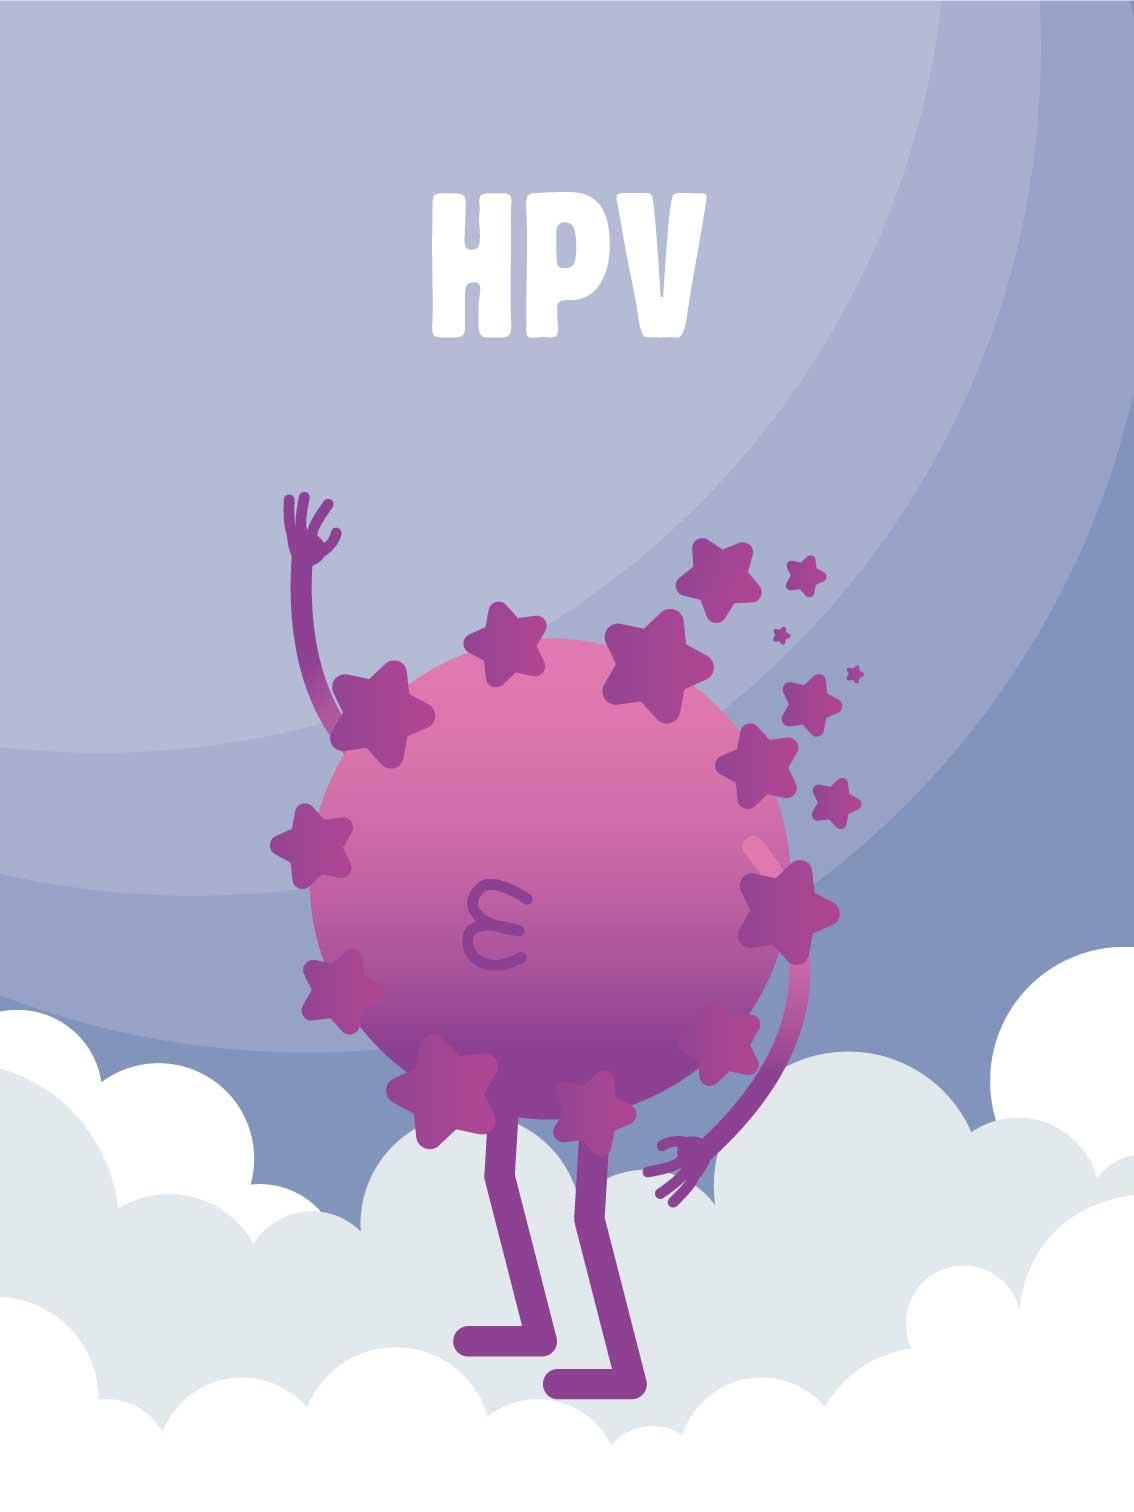 hpv virus test frauen